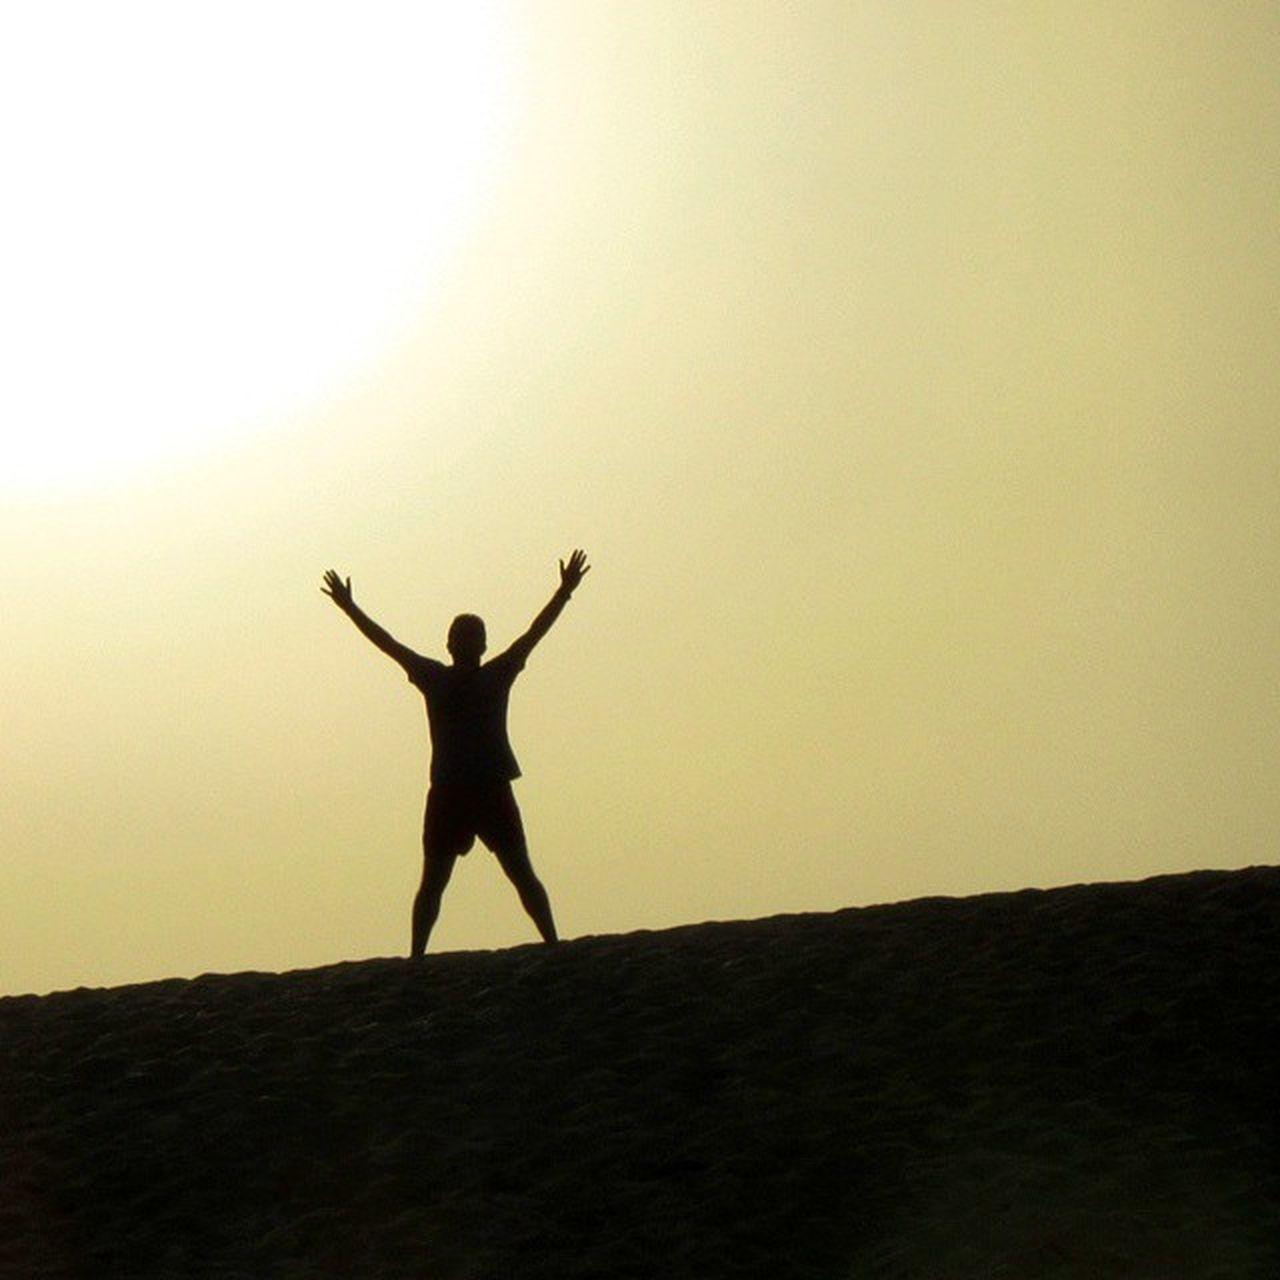 Bolonia Cadiz Playadebolonia Duna Dune Andalucía Sunset Şūr Acontraluz Anochecer Thisisme Backlight Free Freedom Libre Libertad Vacaciones Verano Vacances Holidays Summer Summersun